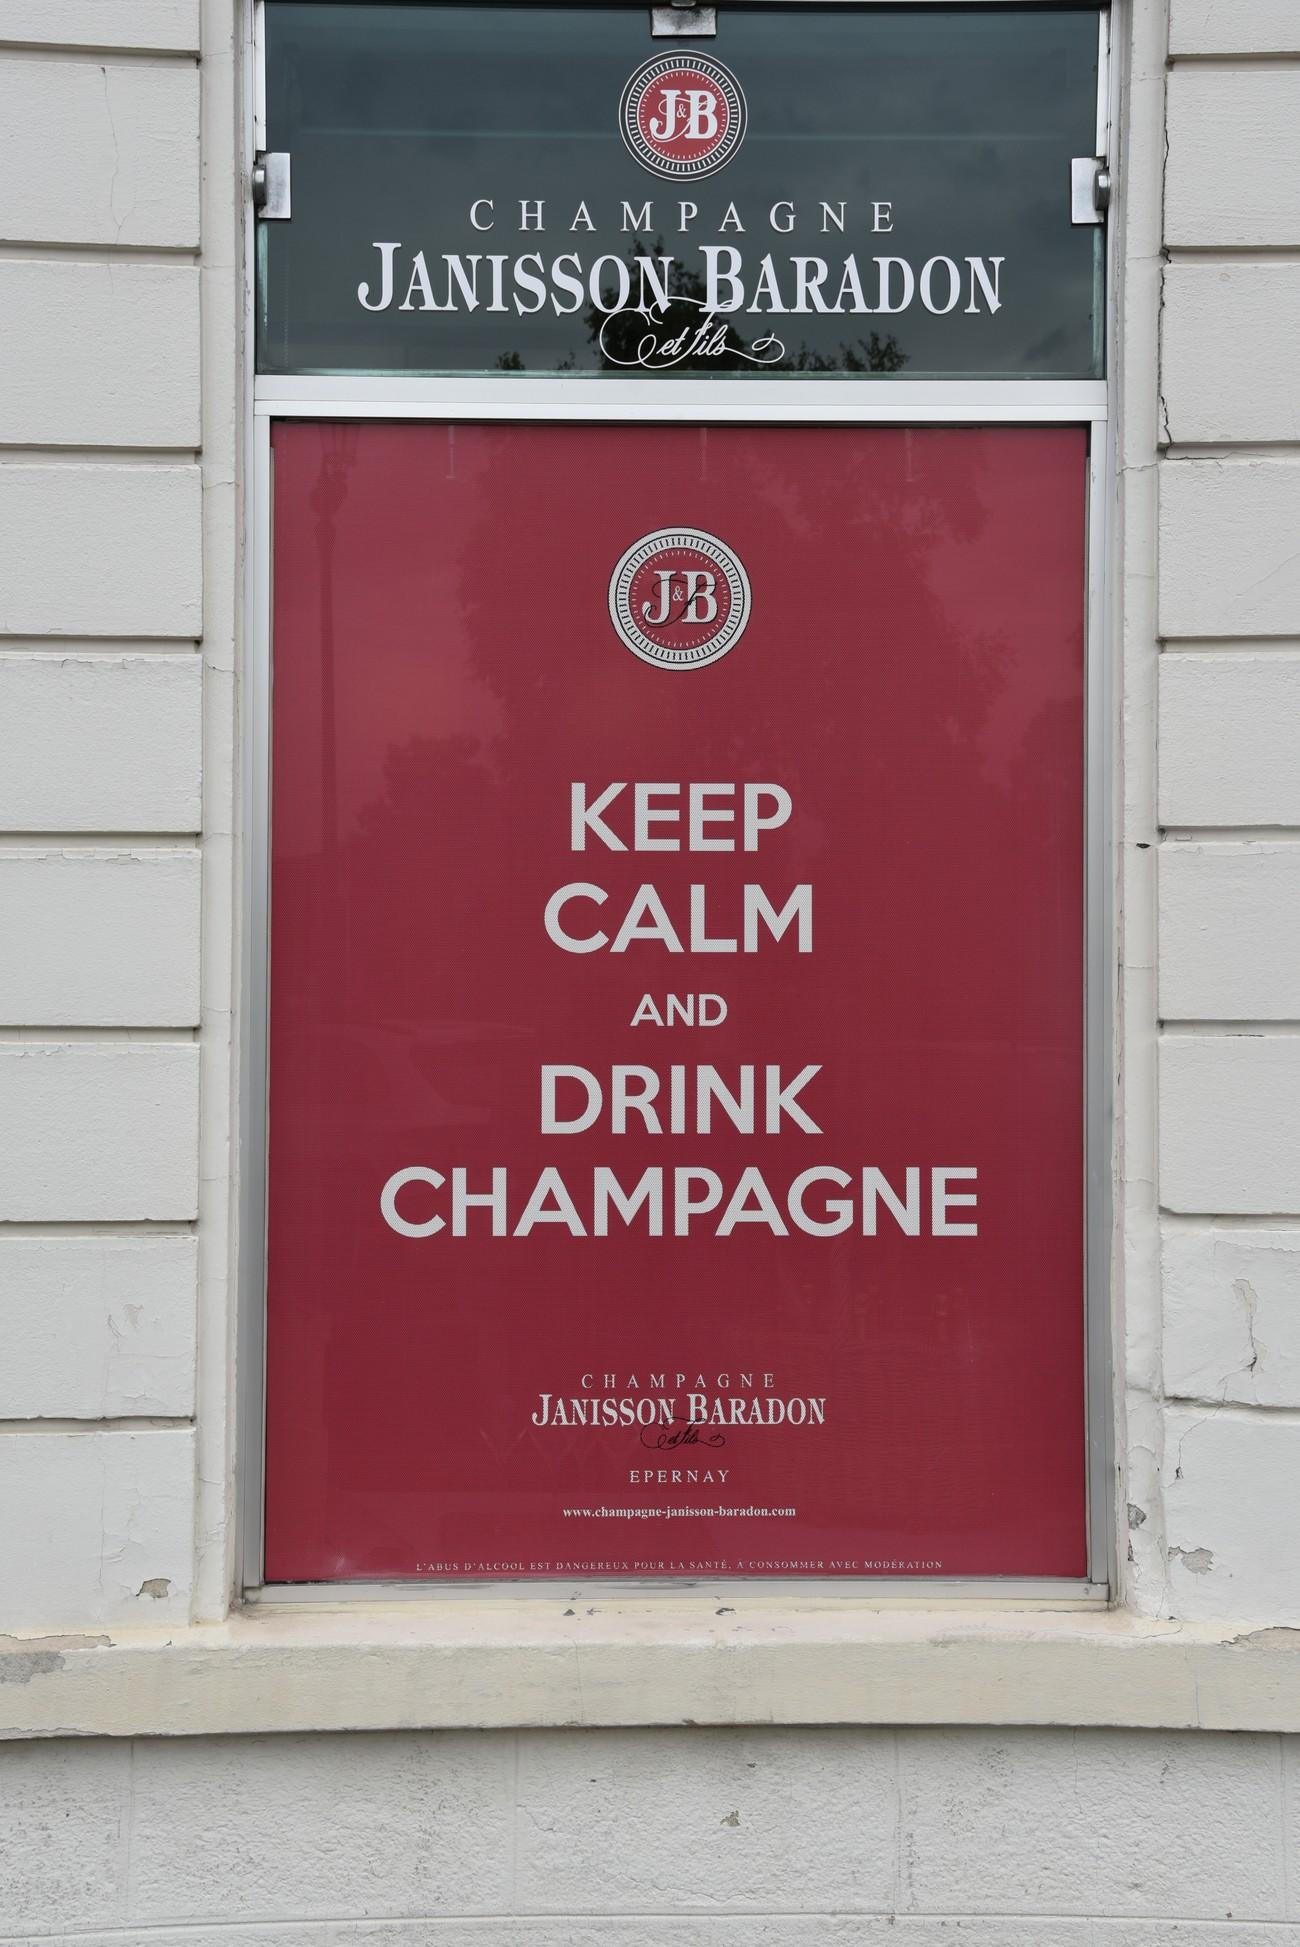 Champagne Janisson-Baradon Winery